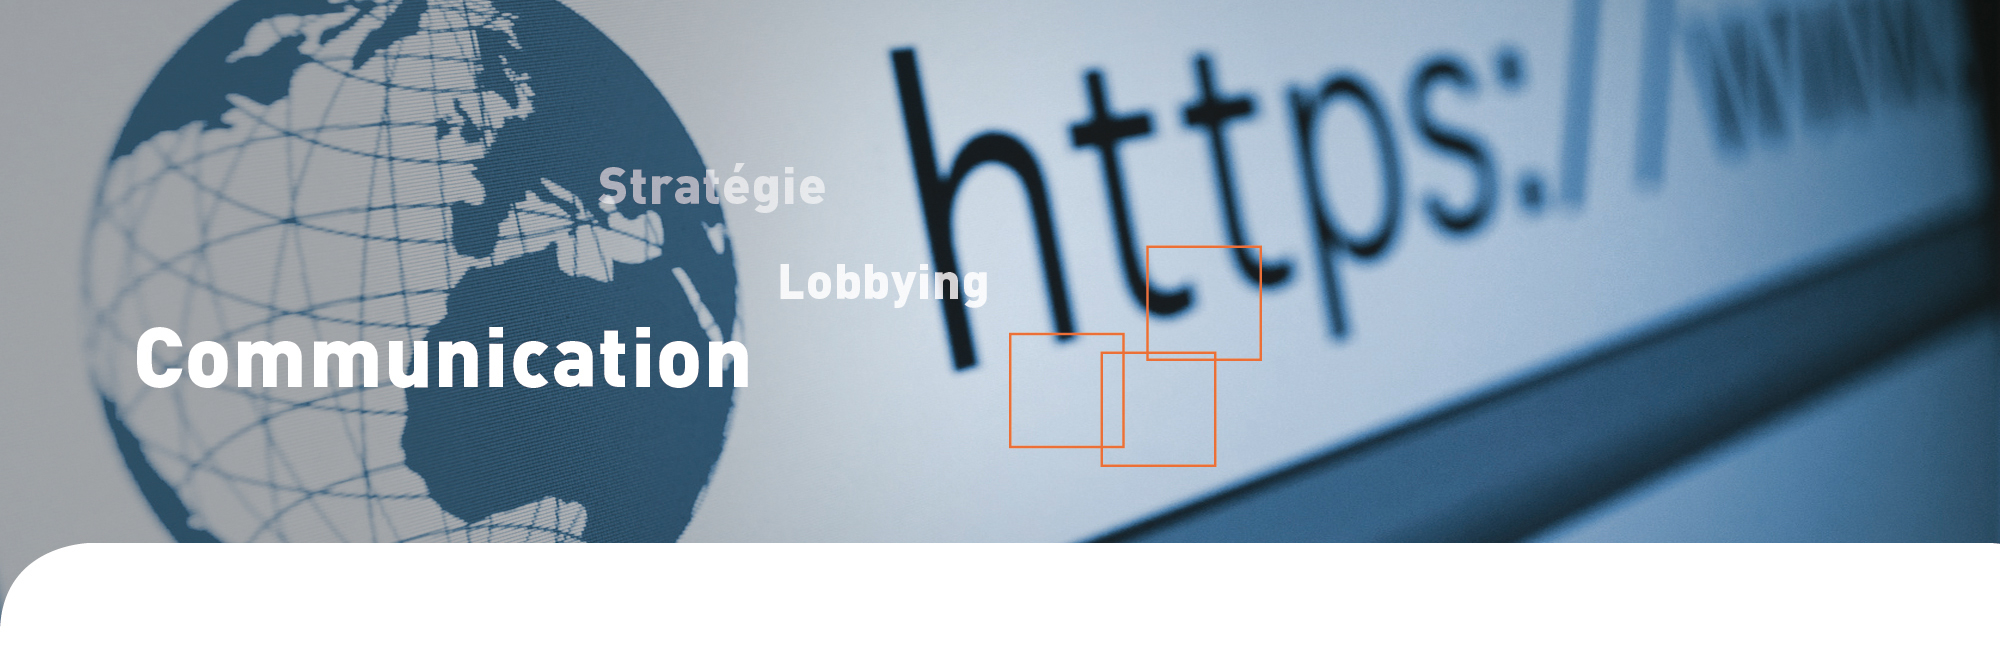 Thomas legrain Conseil - Communication